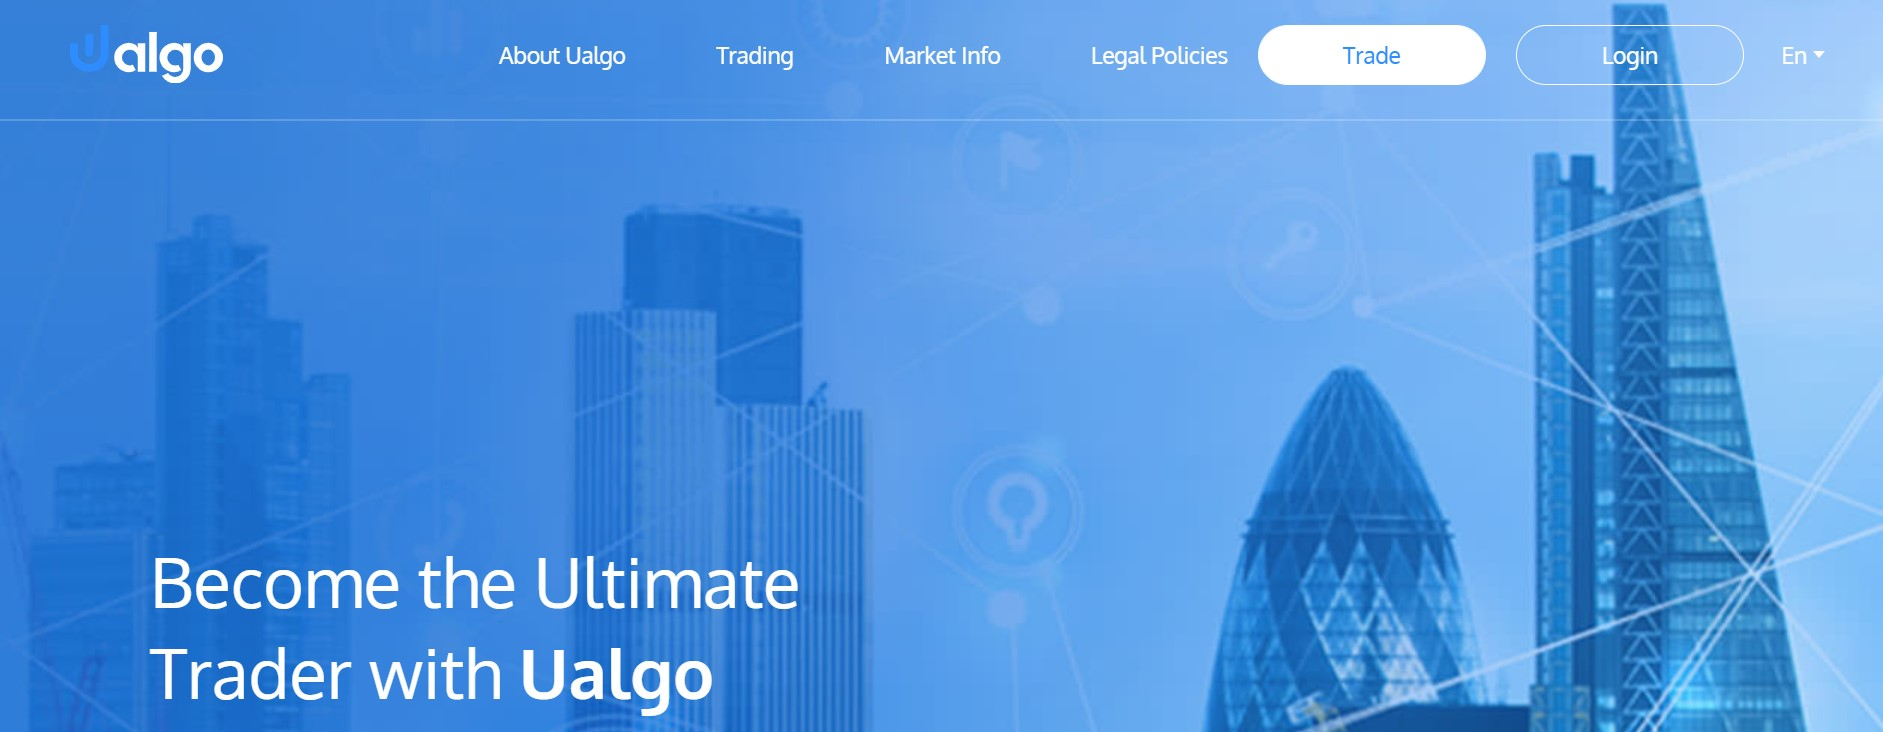 Ualgo website